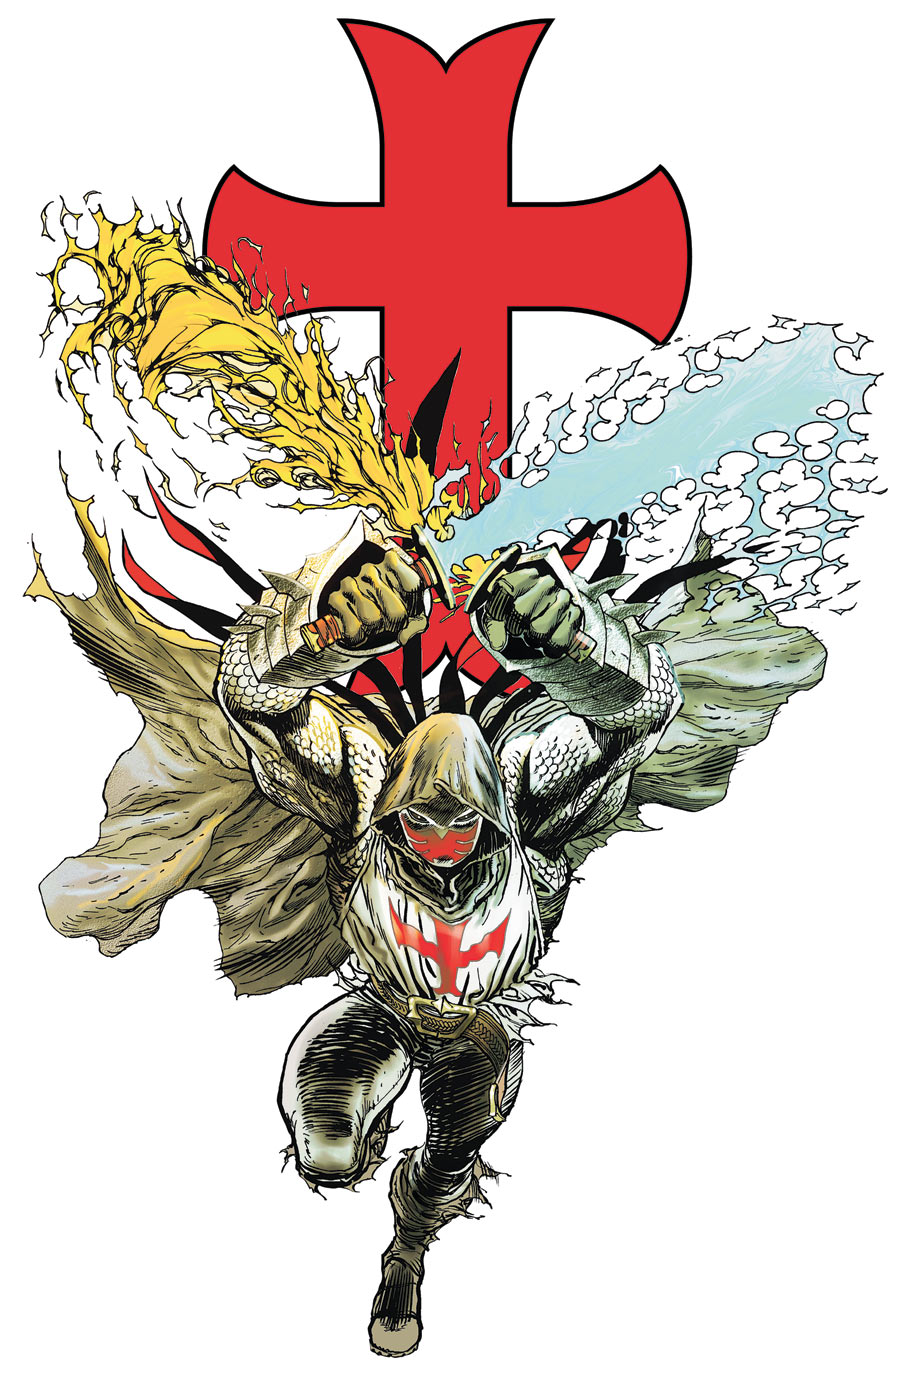 DC COMICS: I SIMBOLI DEGLI EROI (PARTE 2) - BATMAN & CO